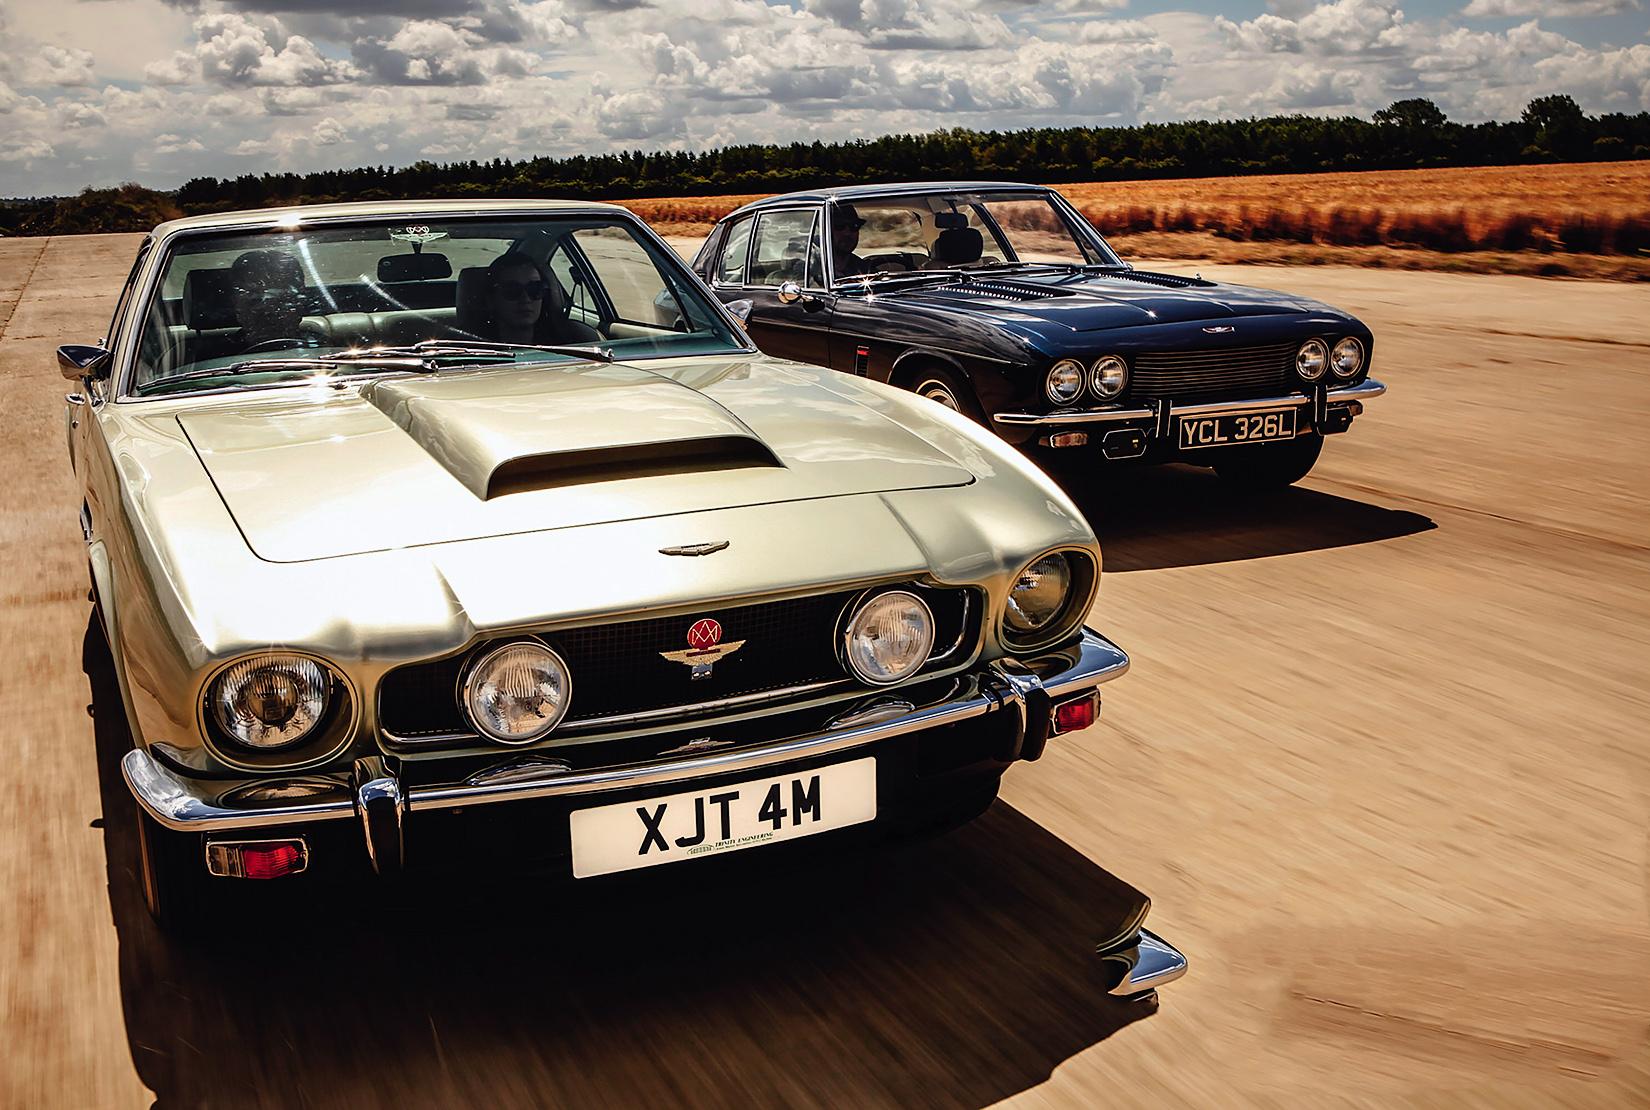 Aston Martin V8 vs Jensen Interceptor III